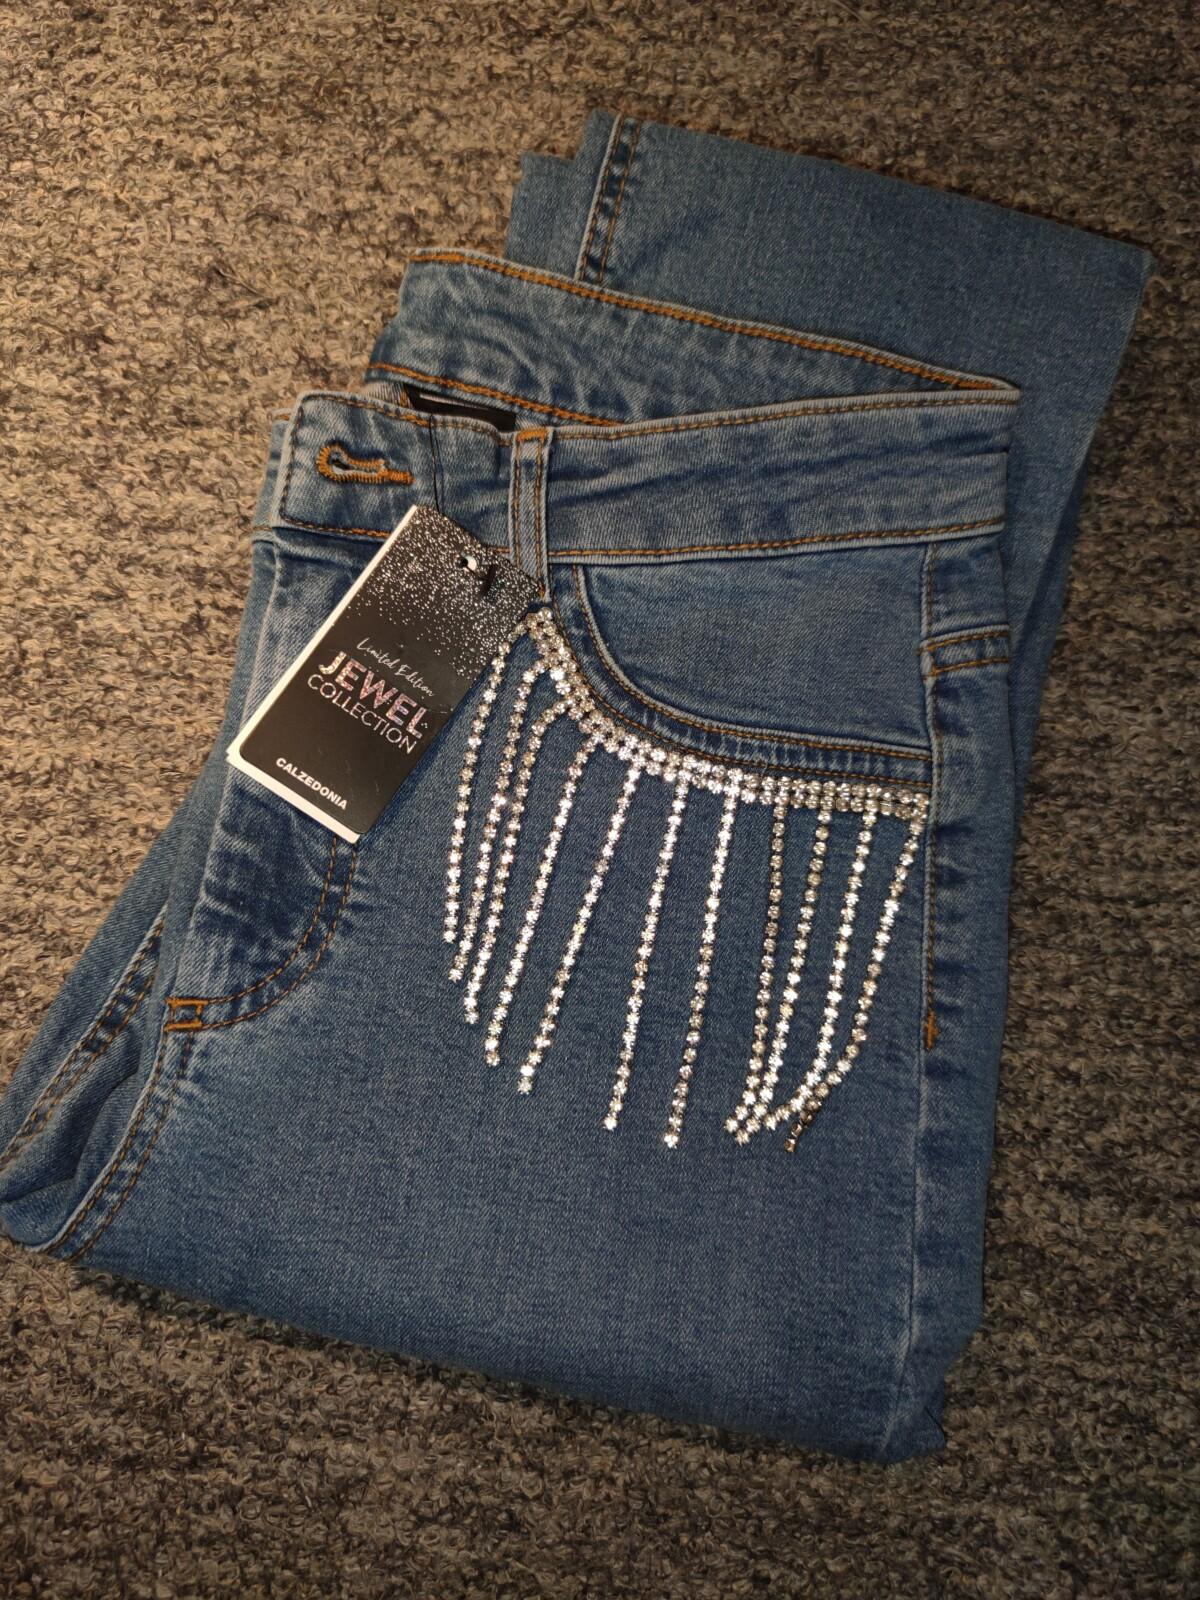 isalicious-isalicious.blogg_.no-trend-mote-stil-fashion-trend-diamant-crystals-jeans-bukser-sko-newin-innkjøp-paris-veske-klær-outfit-antrekk-stradivarius-leather-calzedonia-borgan